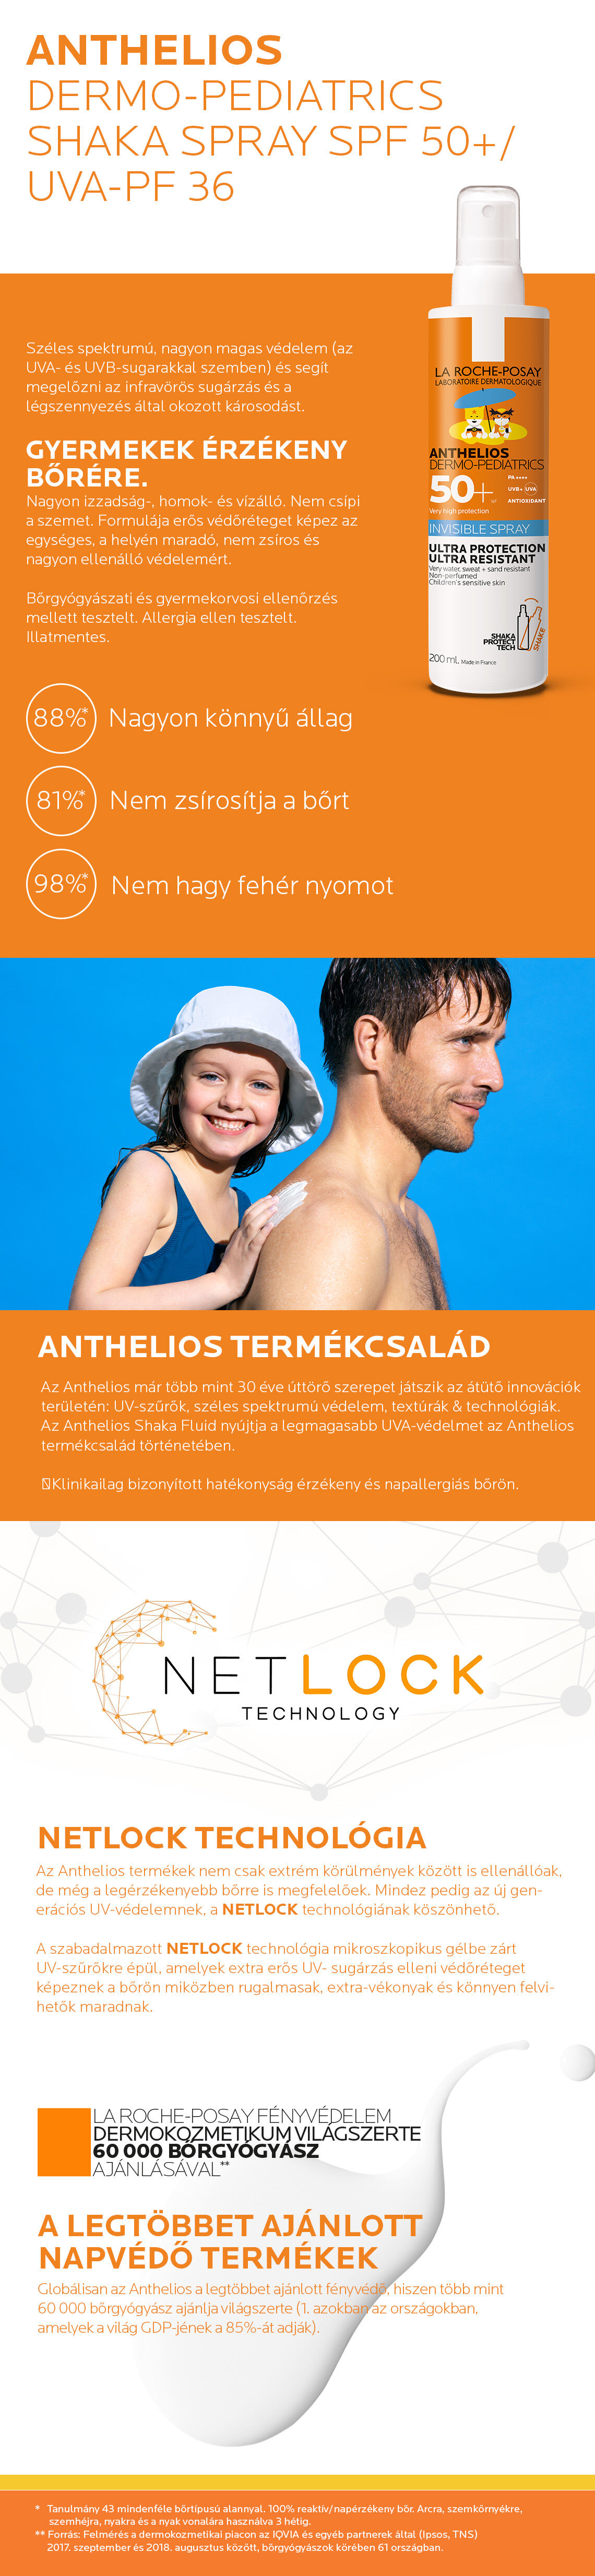 La Roche-Posay Anthelios Dermo-Pediatrics Gyermek Shaka Spray SPF50+